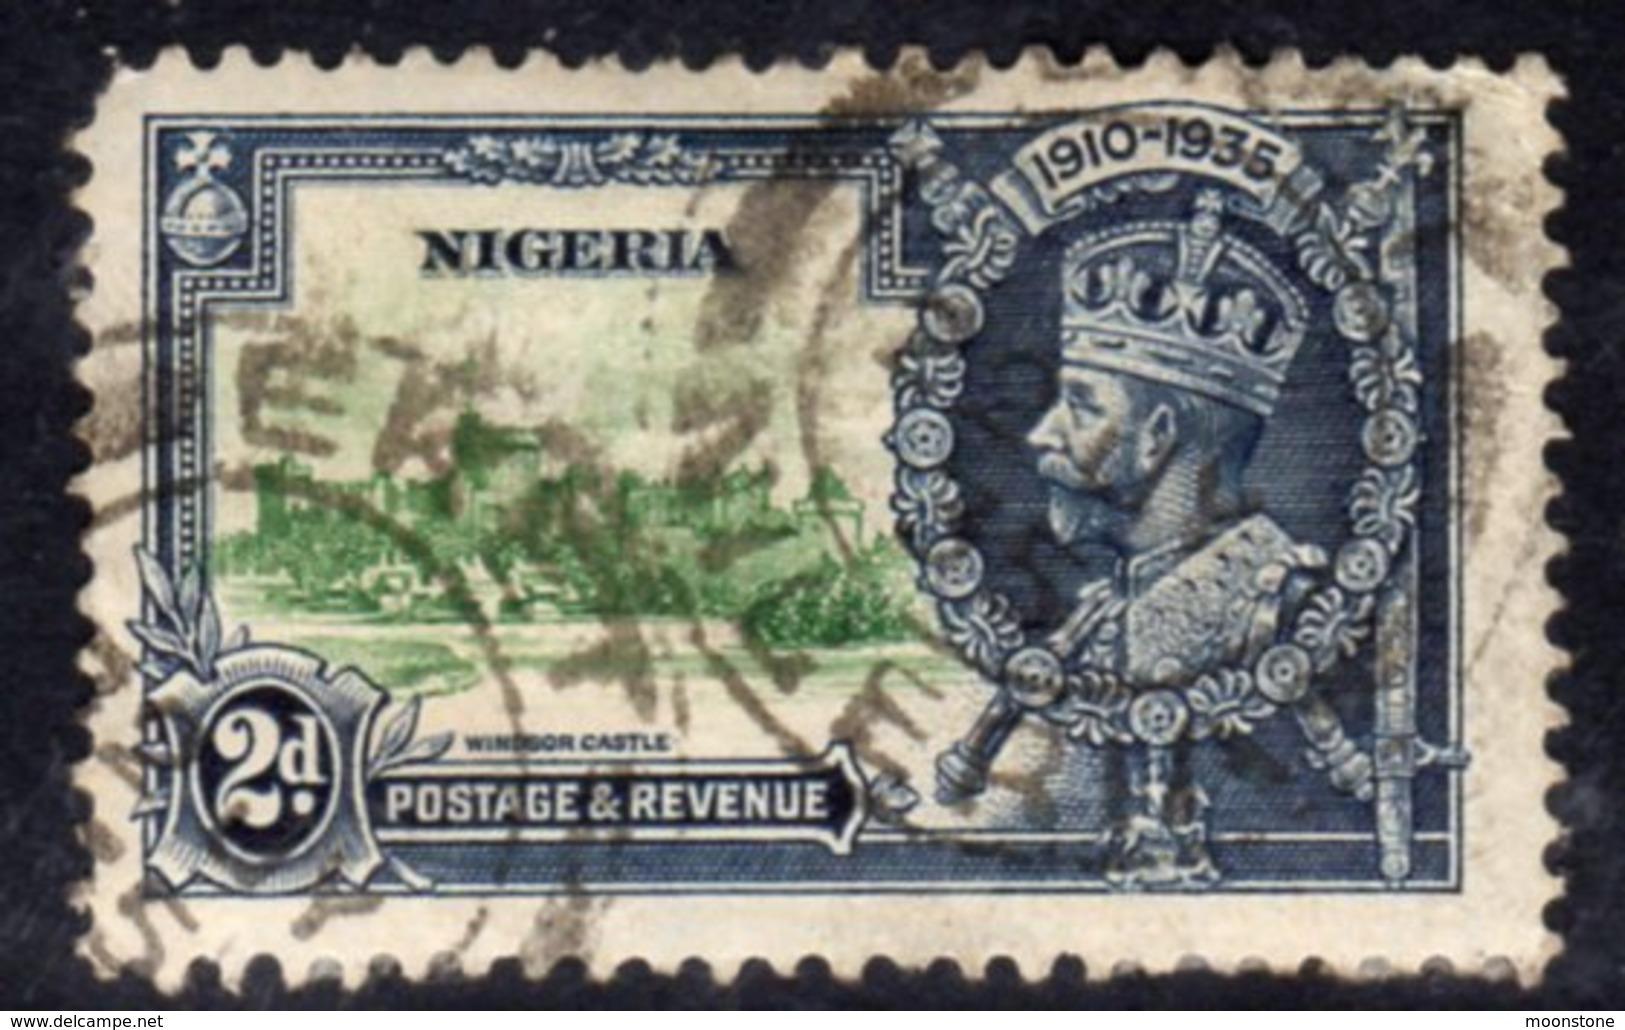 Nigeria GV 1935 Silver Jubilee 2d Value, Used, SG 31 (A) - Nigeria (...-1960)